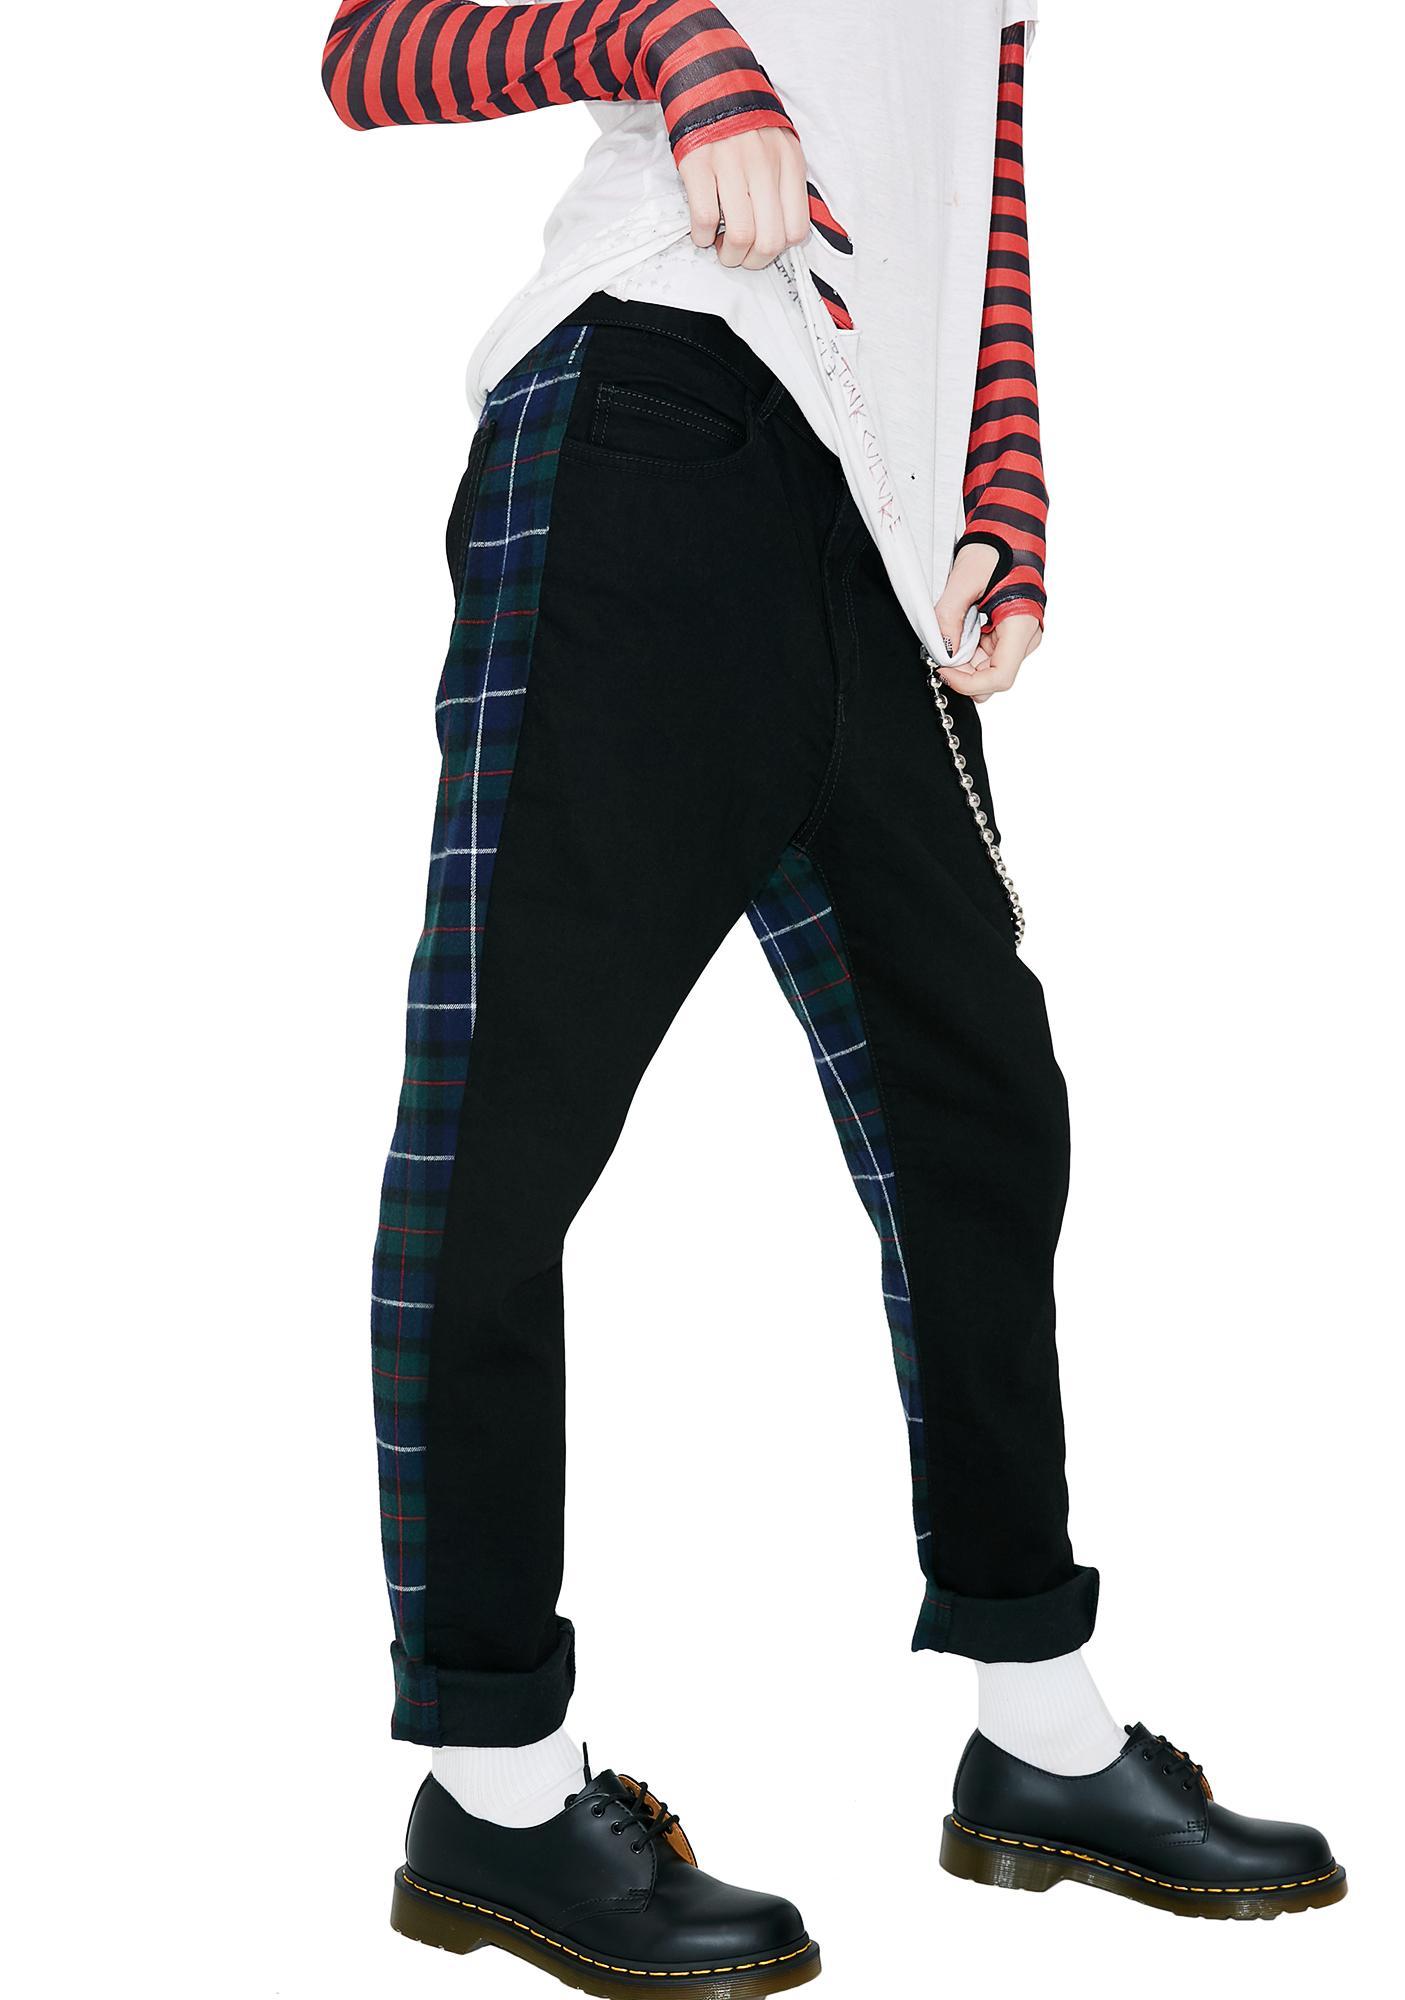 Happiness Denim Tartan Pants